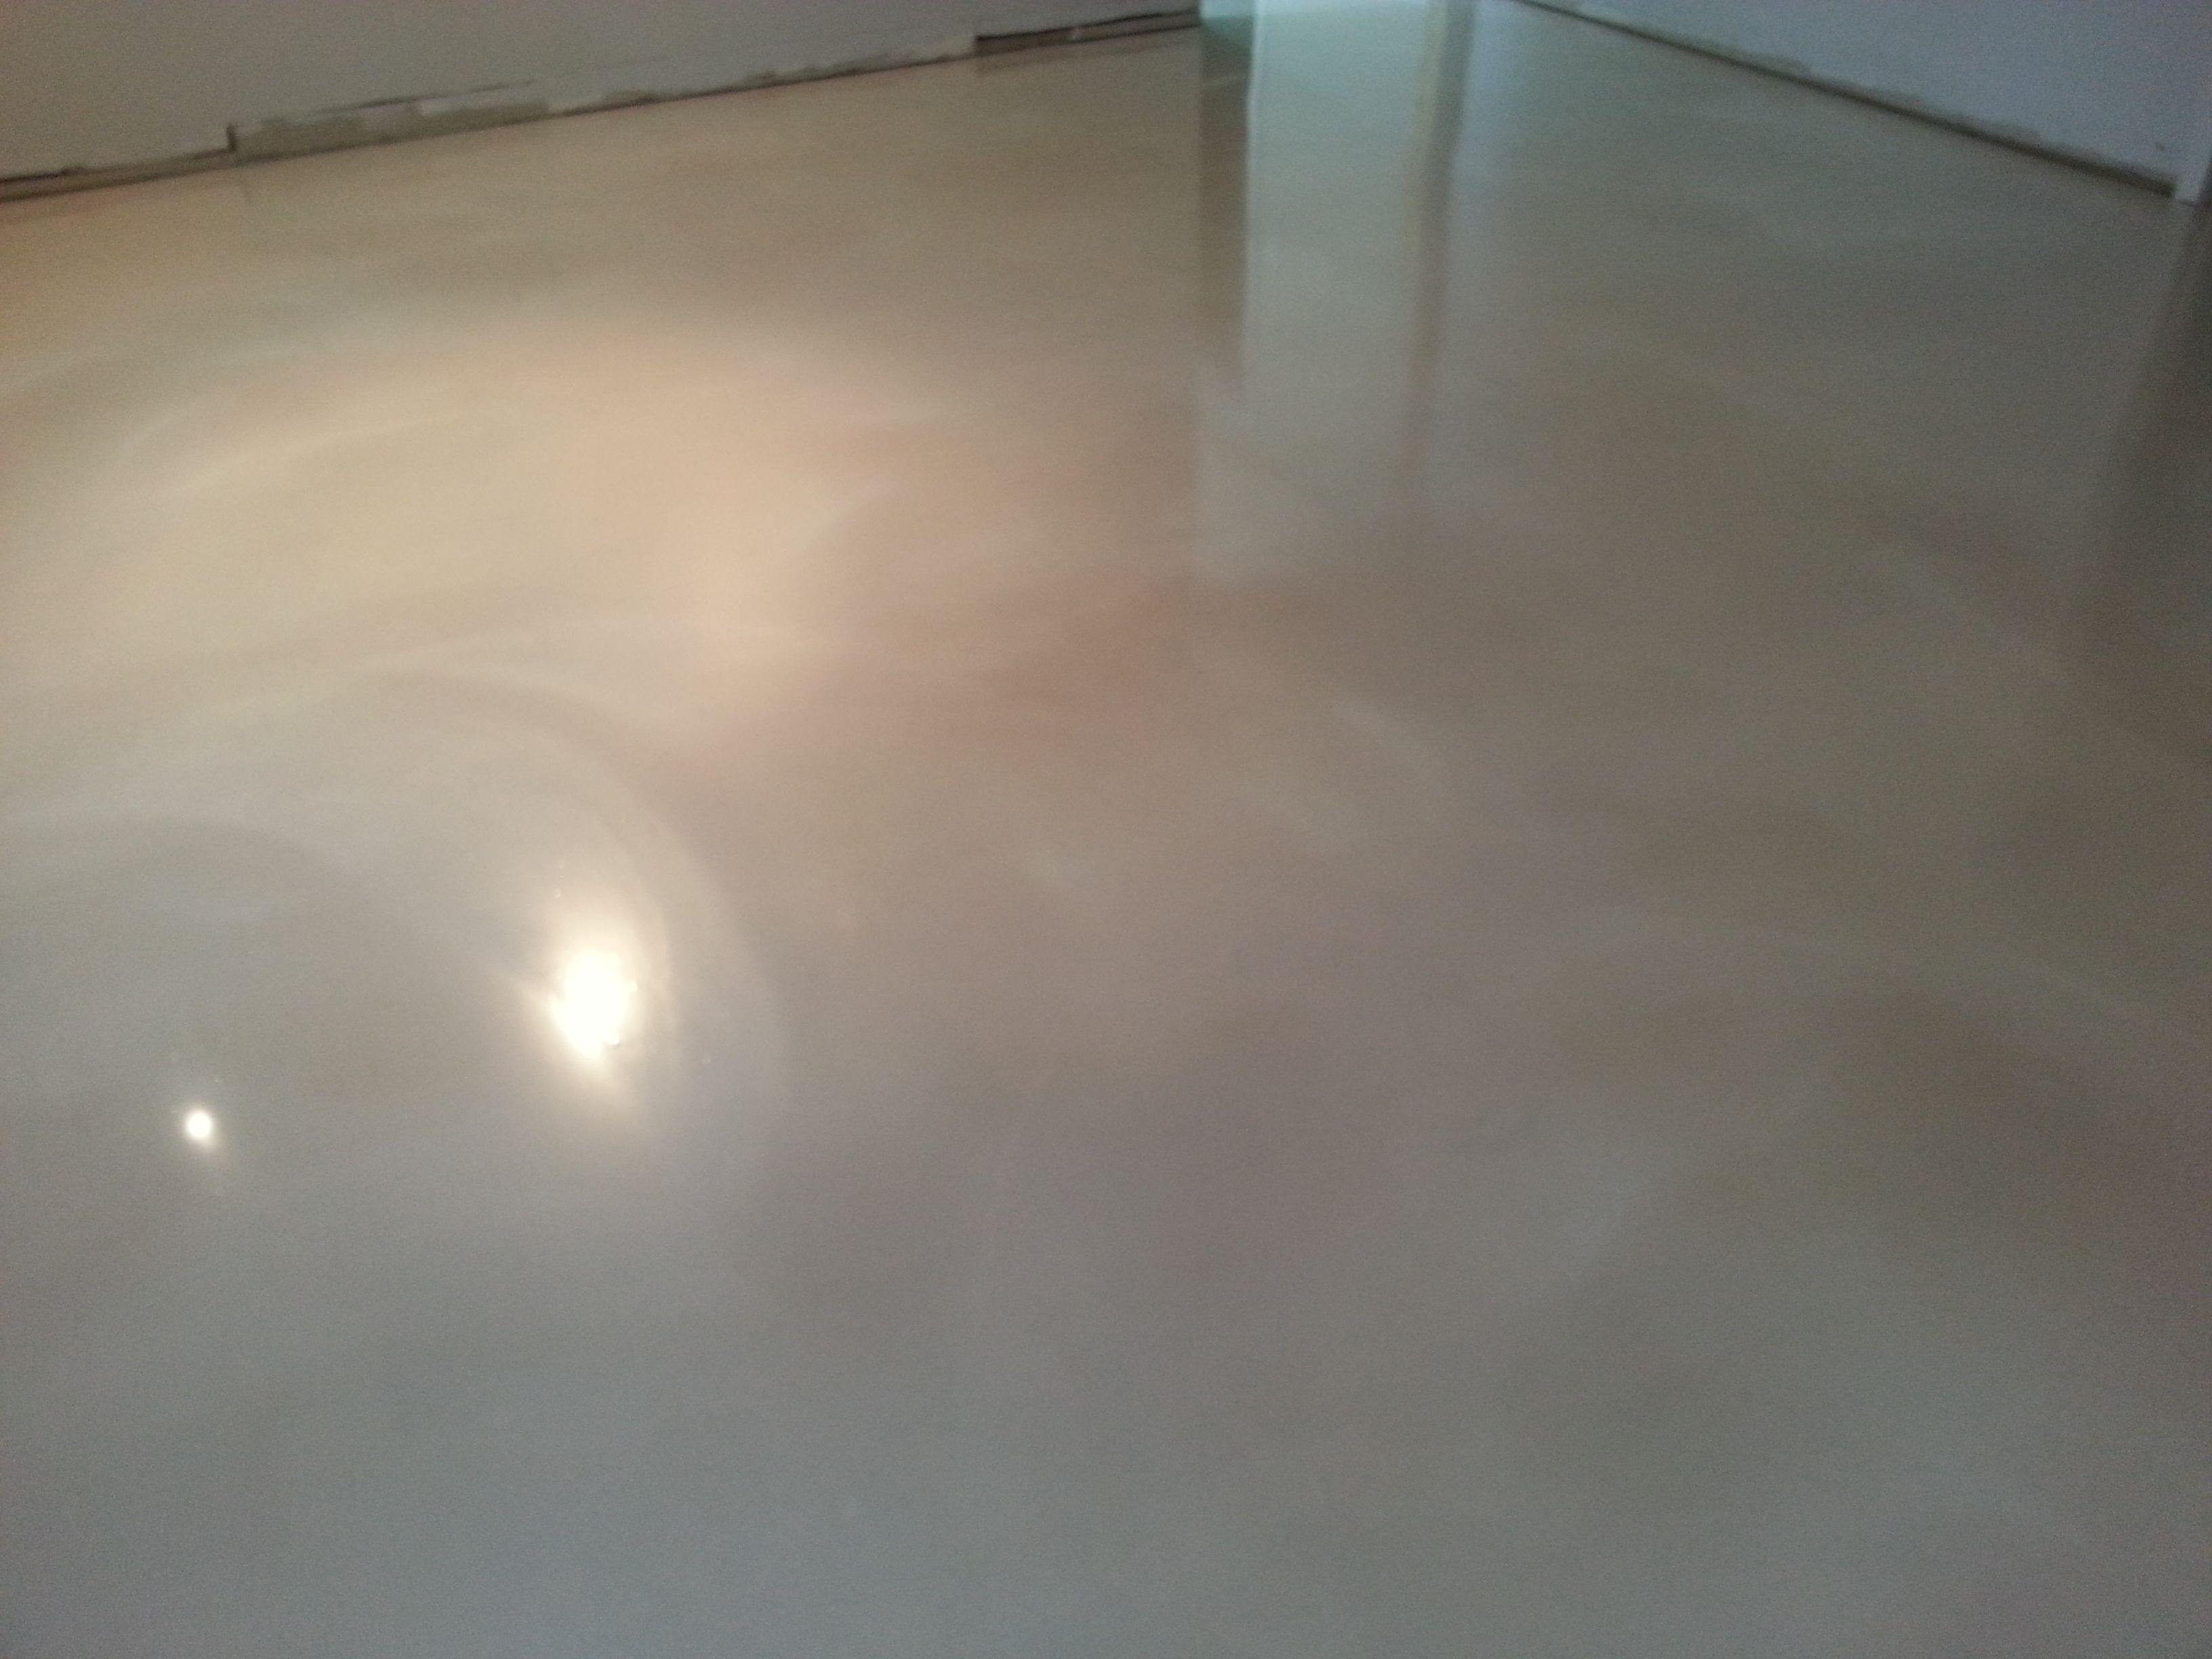 Opal White Metallic Flooring Myrtle Beach Sc Job Concrete Decor Metal Floor Metallic Epoxy Floor